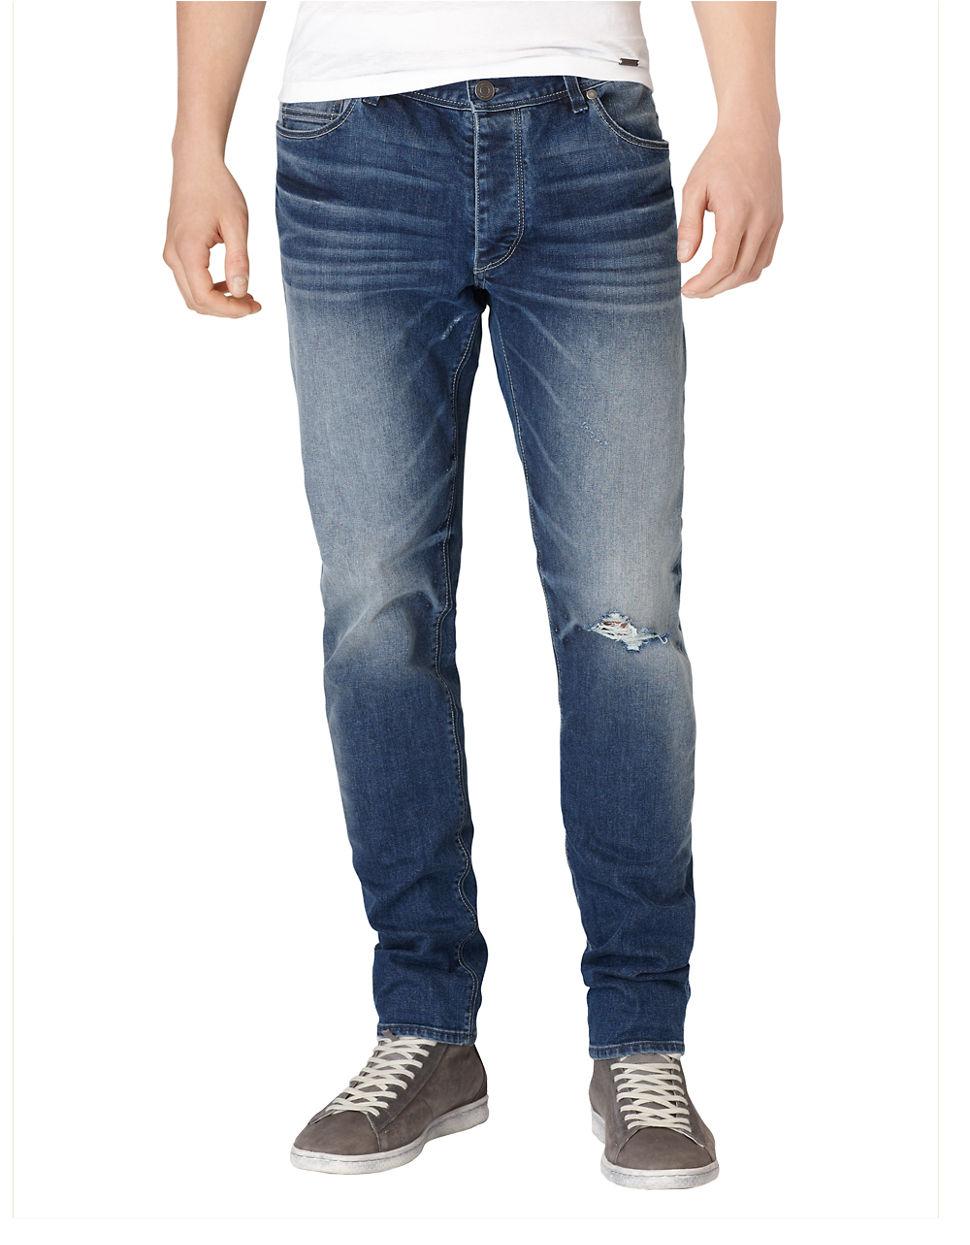 calvin klein jeans deep sky slim straight leg jeans in. Black Bedroom Furniture Sets. Home Design Ideas